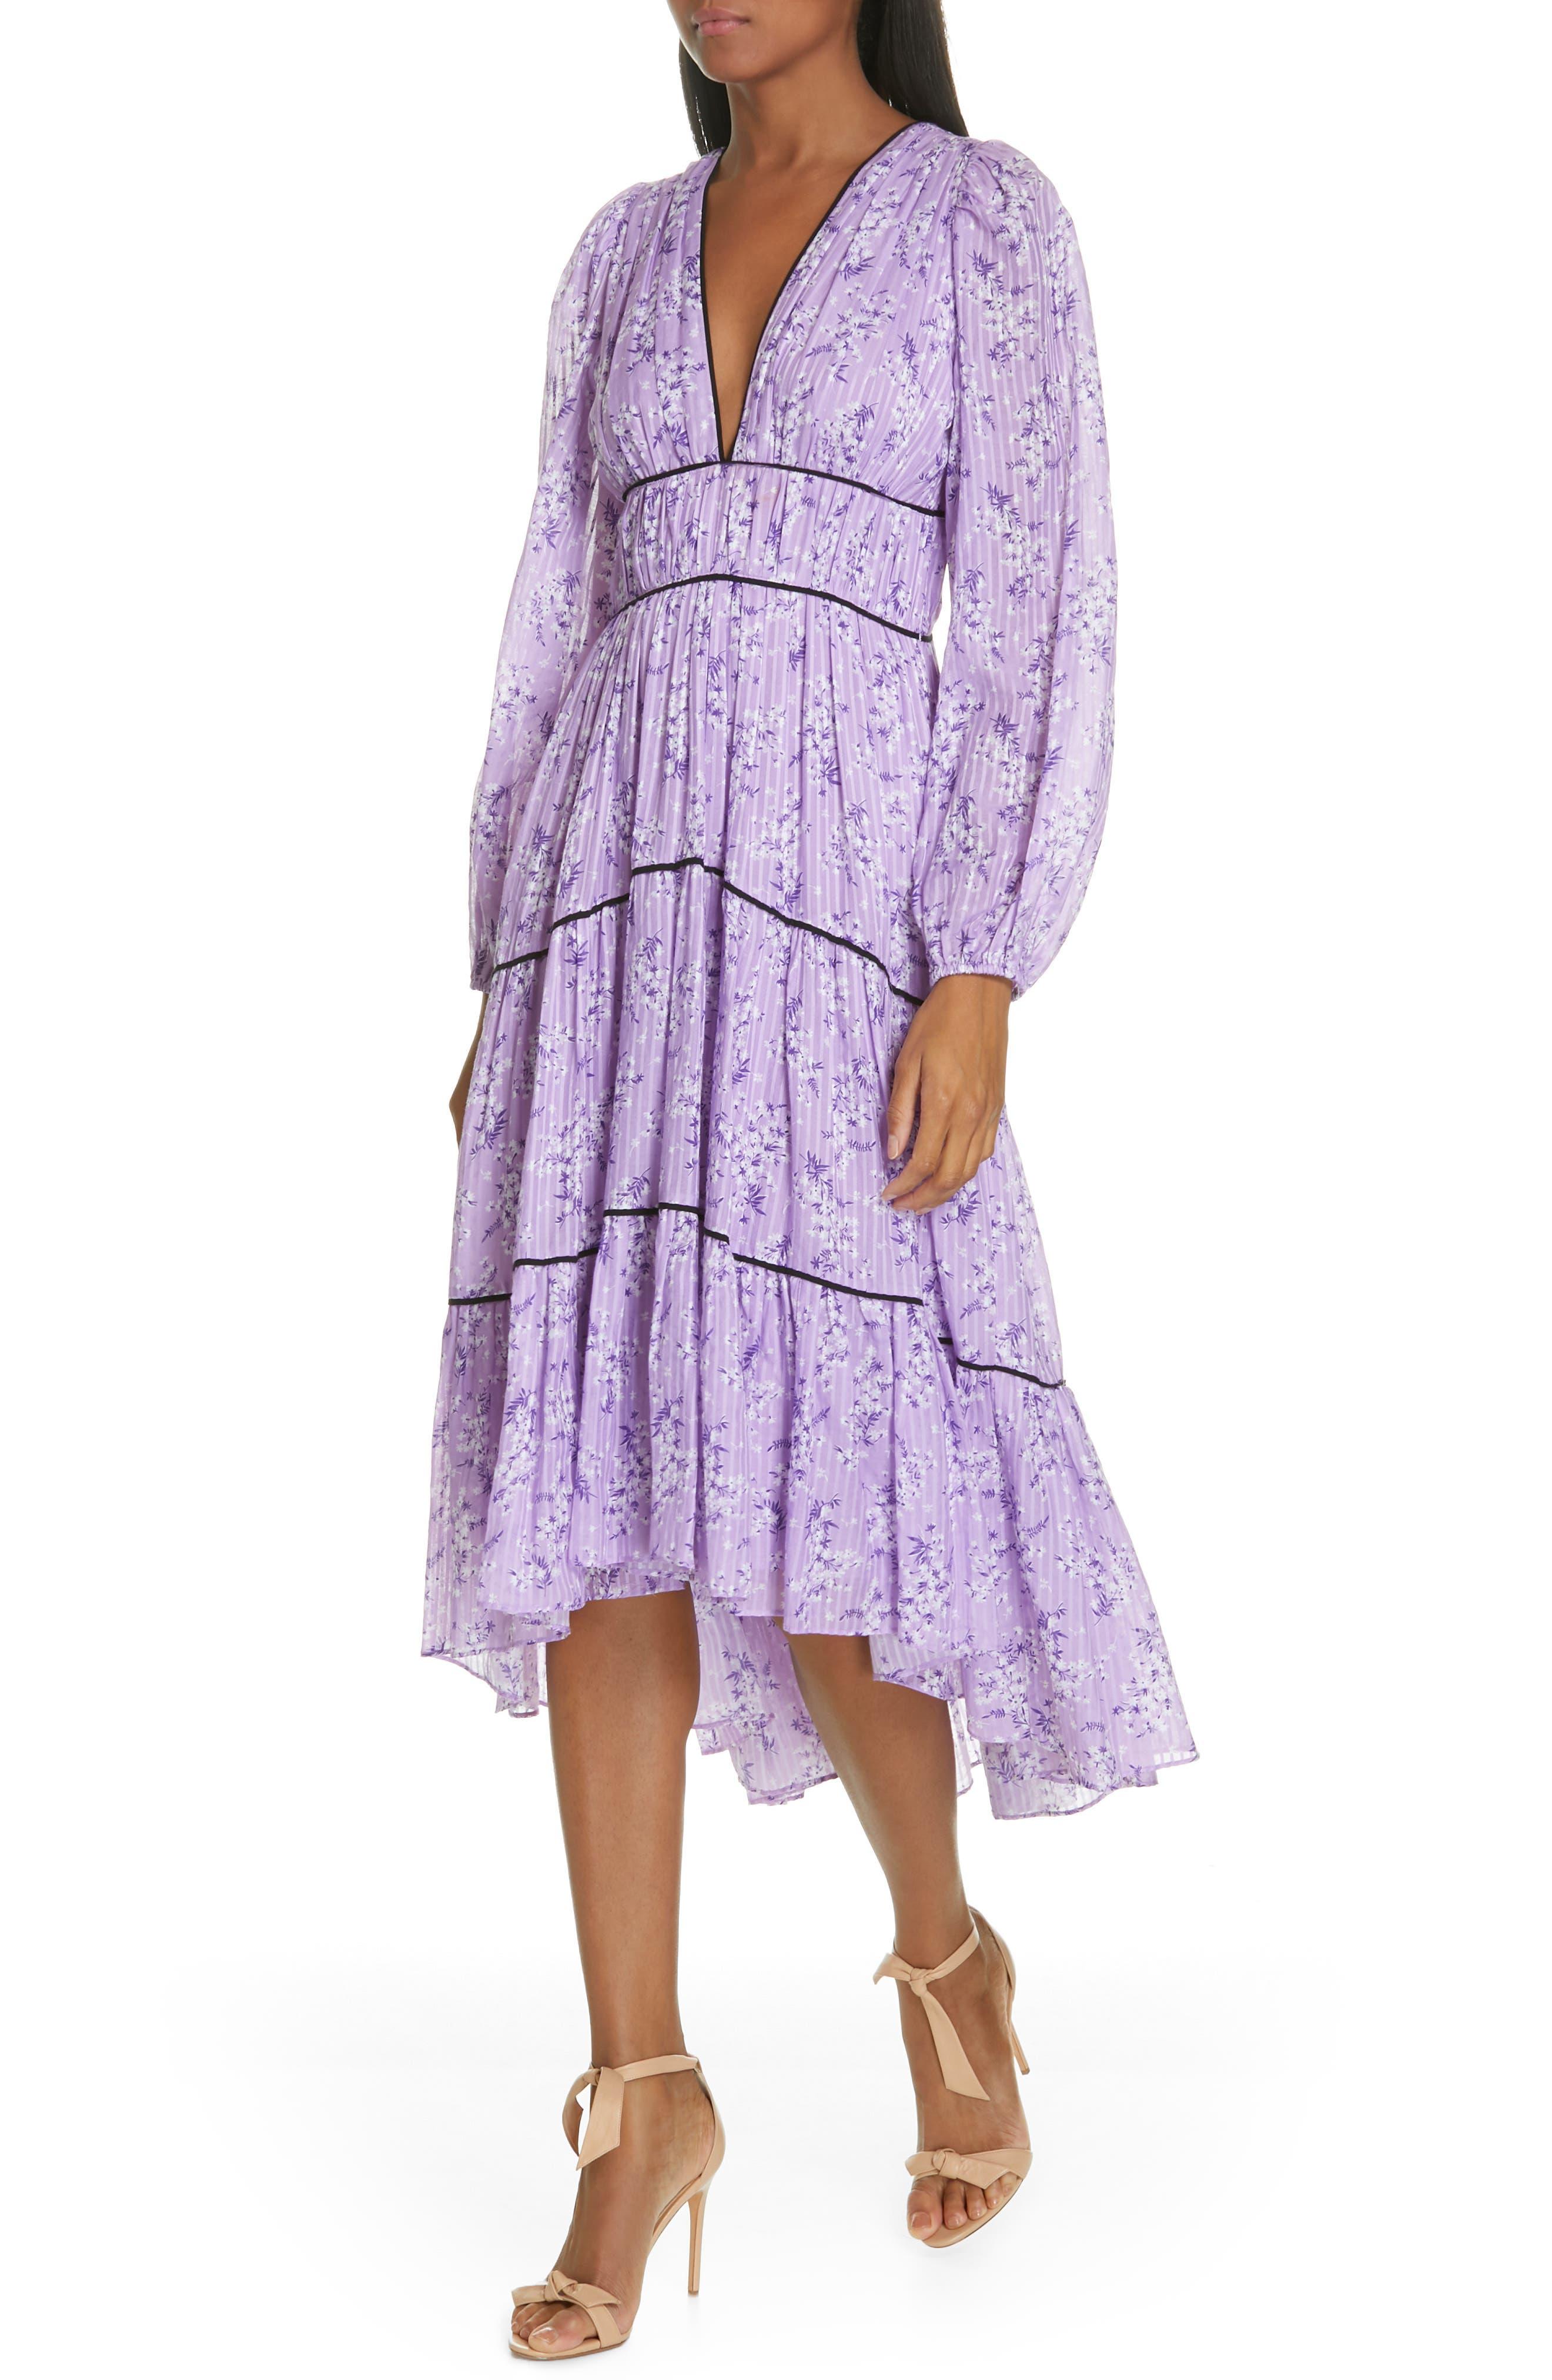 Joan Floral Print Cotton & Silk Midi Dress,                             Alternate thumbnail 4, color,                             LILAC